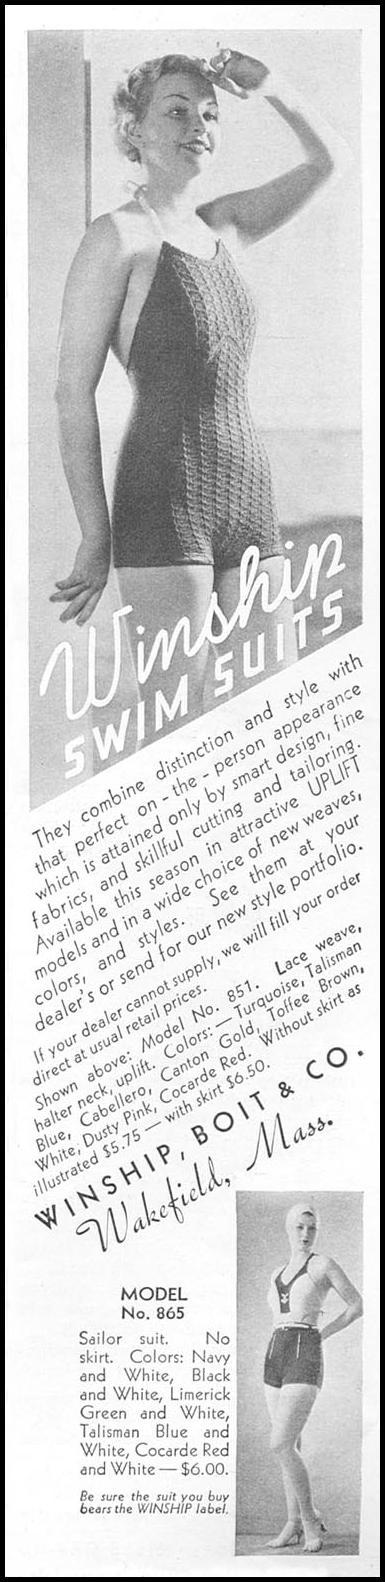 WINSHIP SWIM SUITS GOOD HOUSEKEEPING 06/01/1935 p. 149